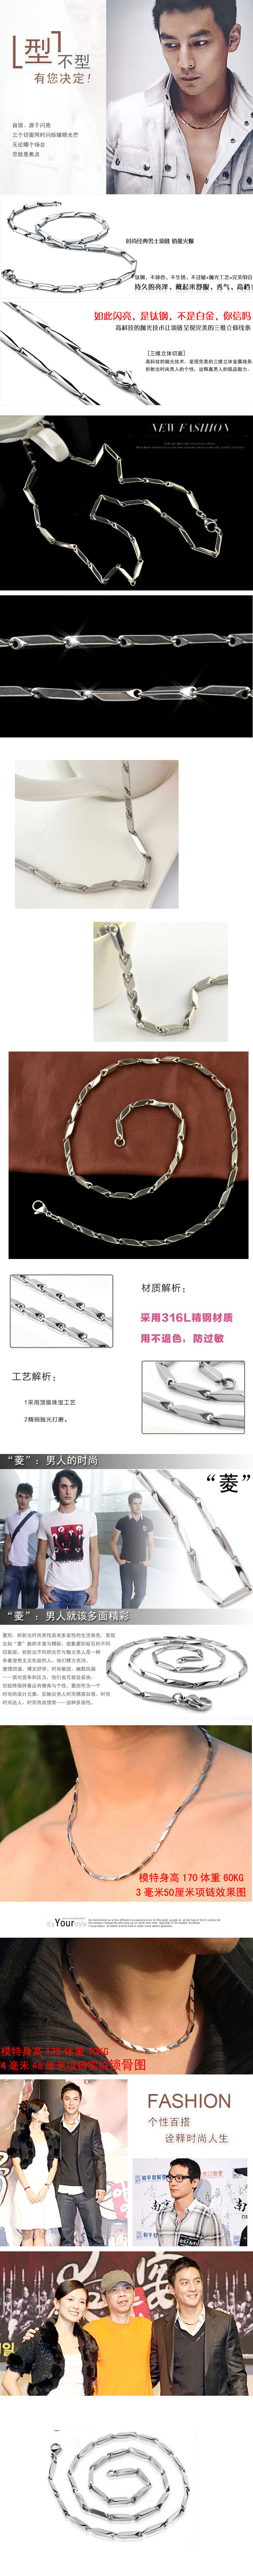 45cm3mm Trendy Fashionable Diamond Titanium Steel Men's Necklace NHSC203469